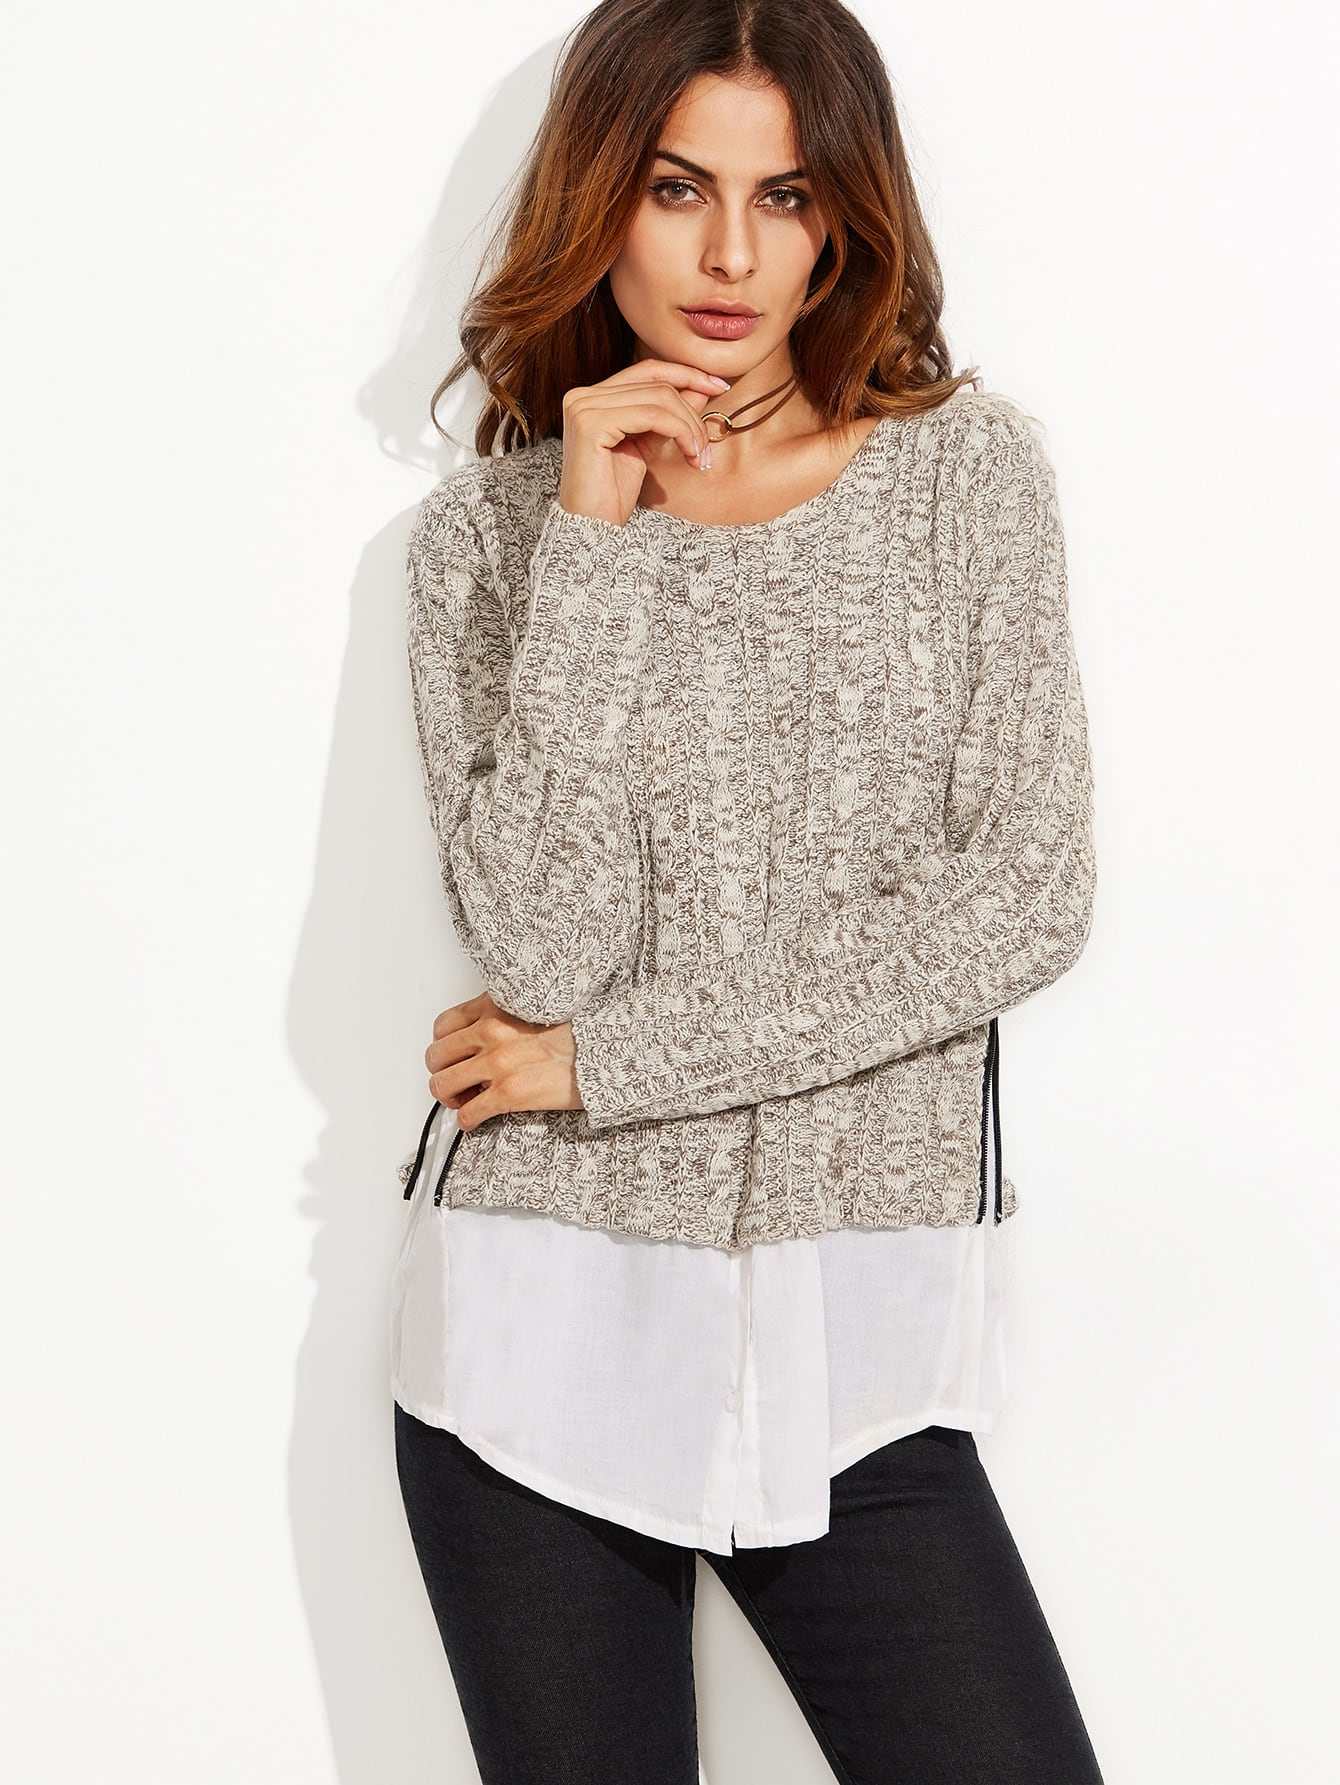 sweater160817706_2